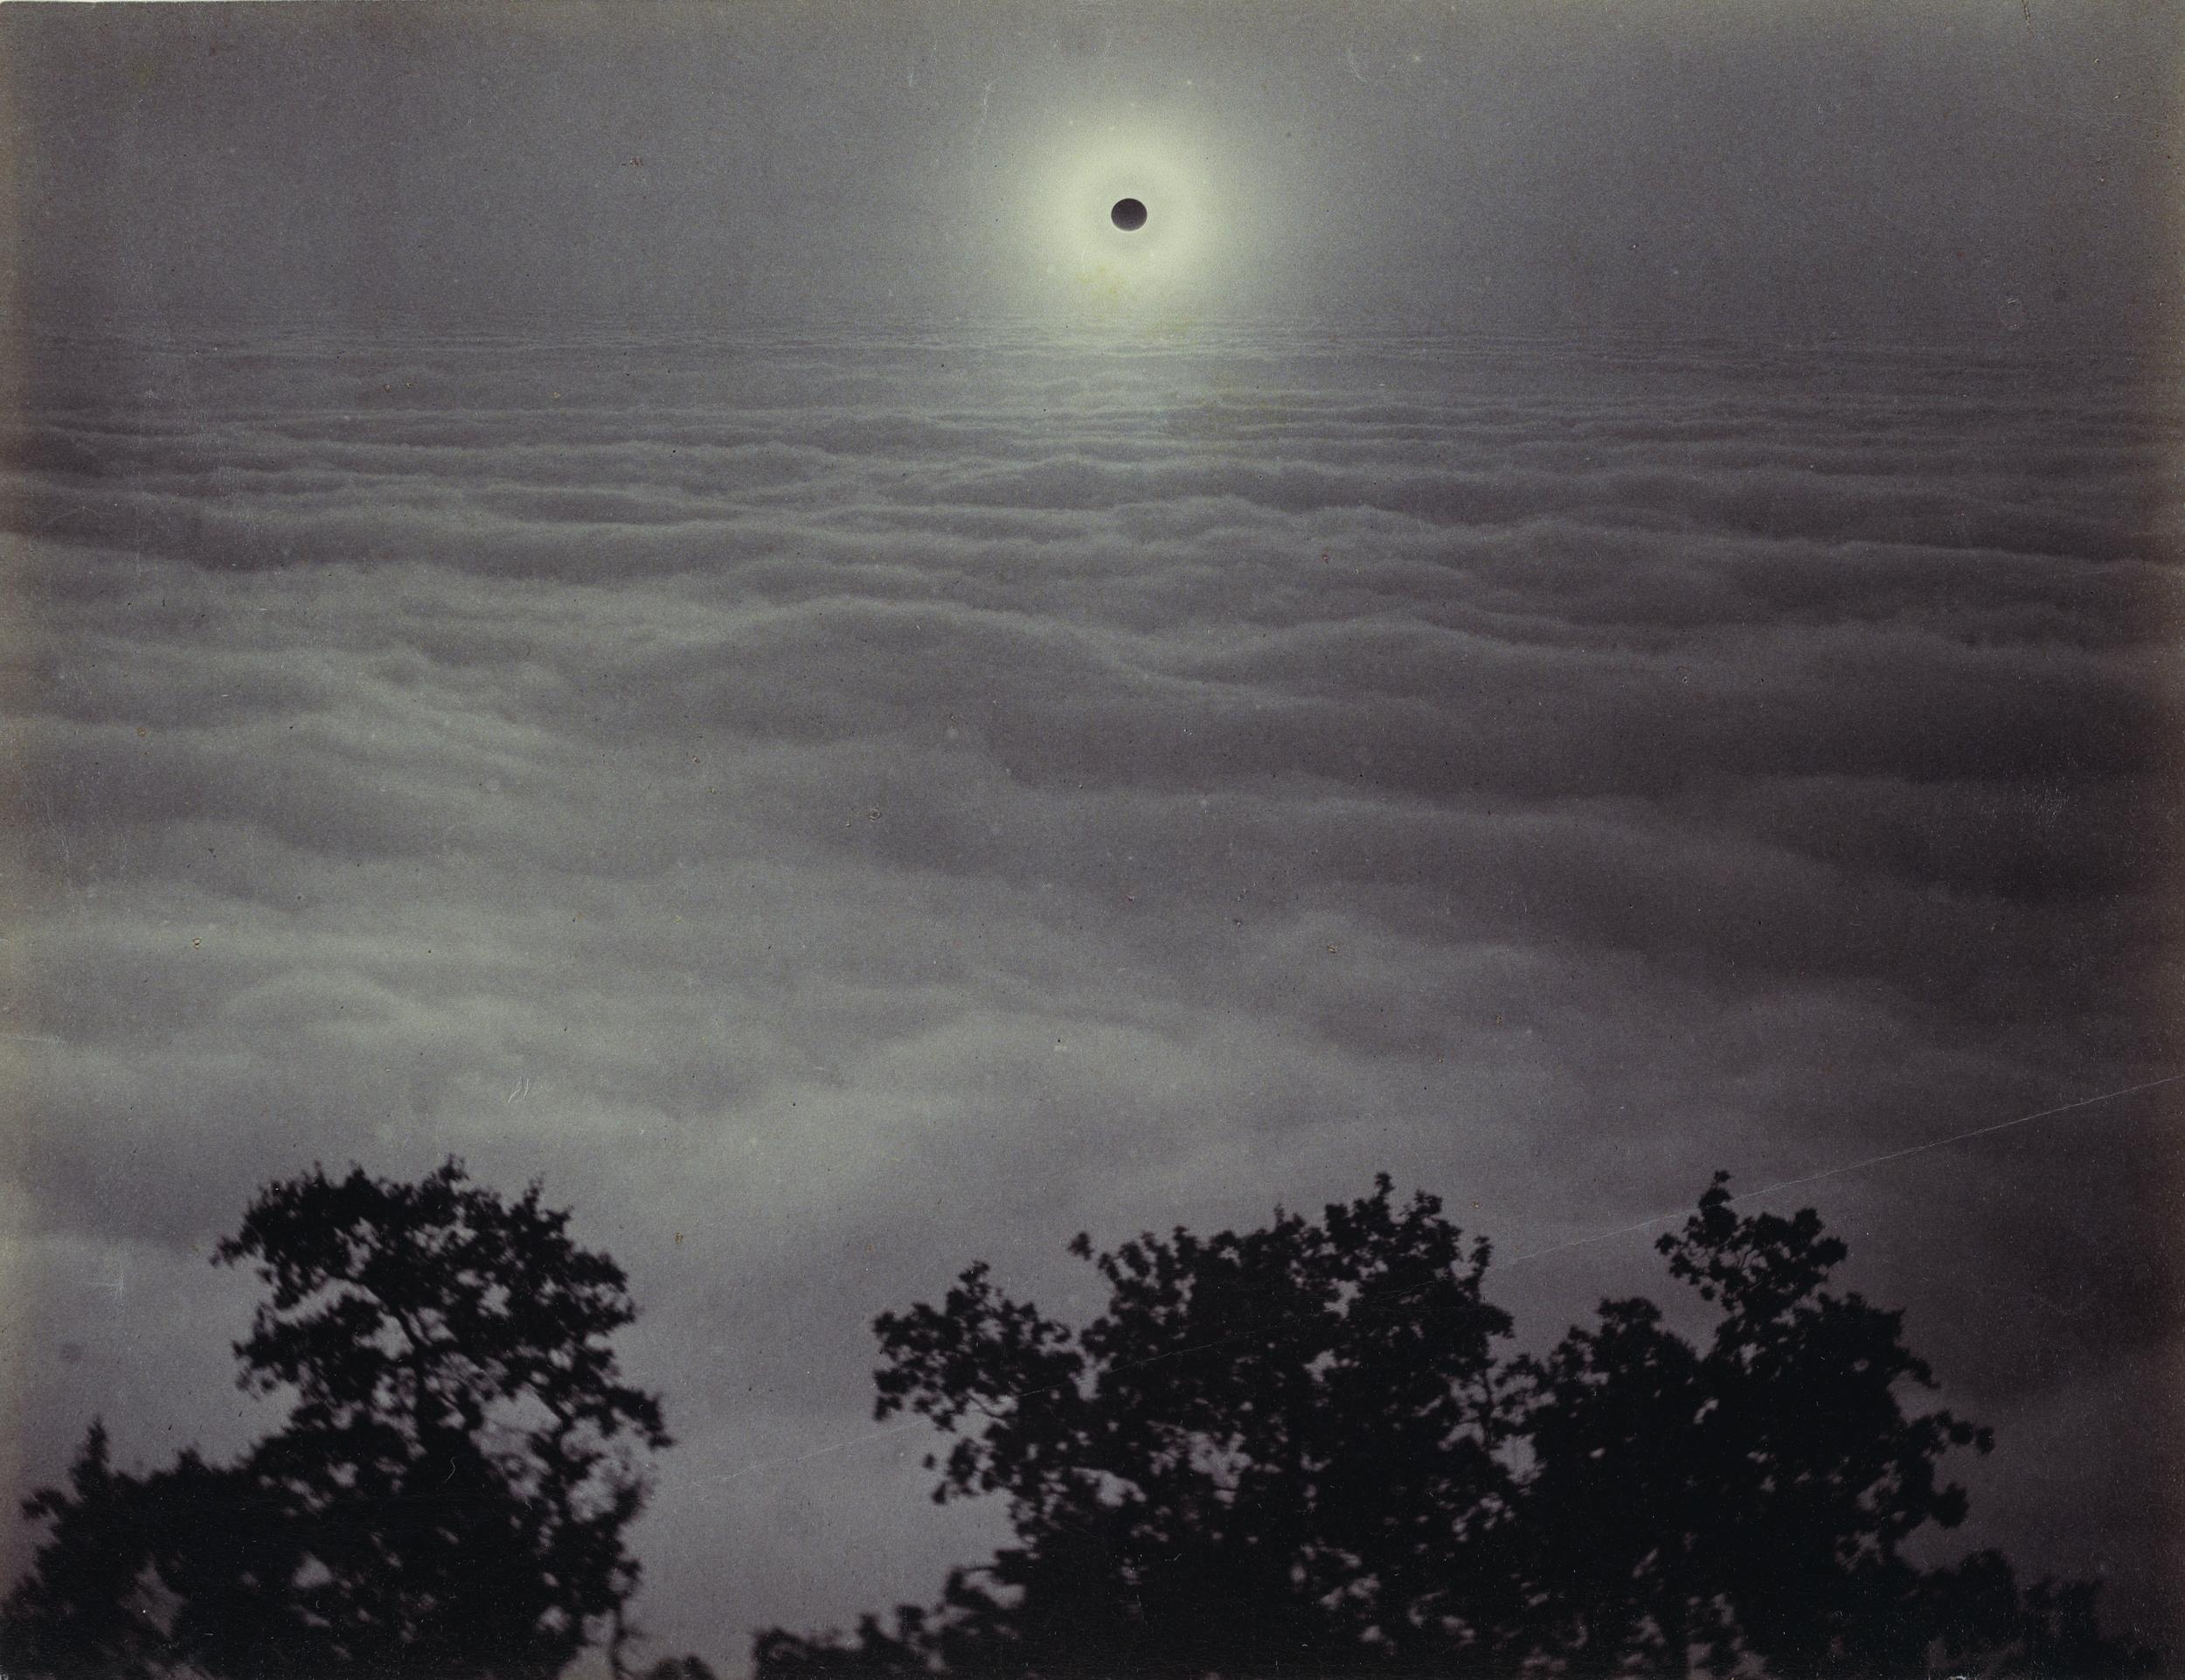 "Carleton Watkins. ""Solar Eclipse,"" (1889). Albumen silver print. 16.5 x 21.6 centimeters.Courtesy The J. Paul Getty Museum, Los Angeles"